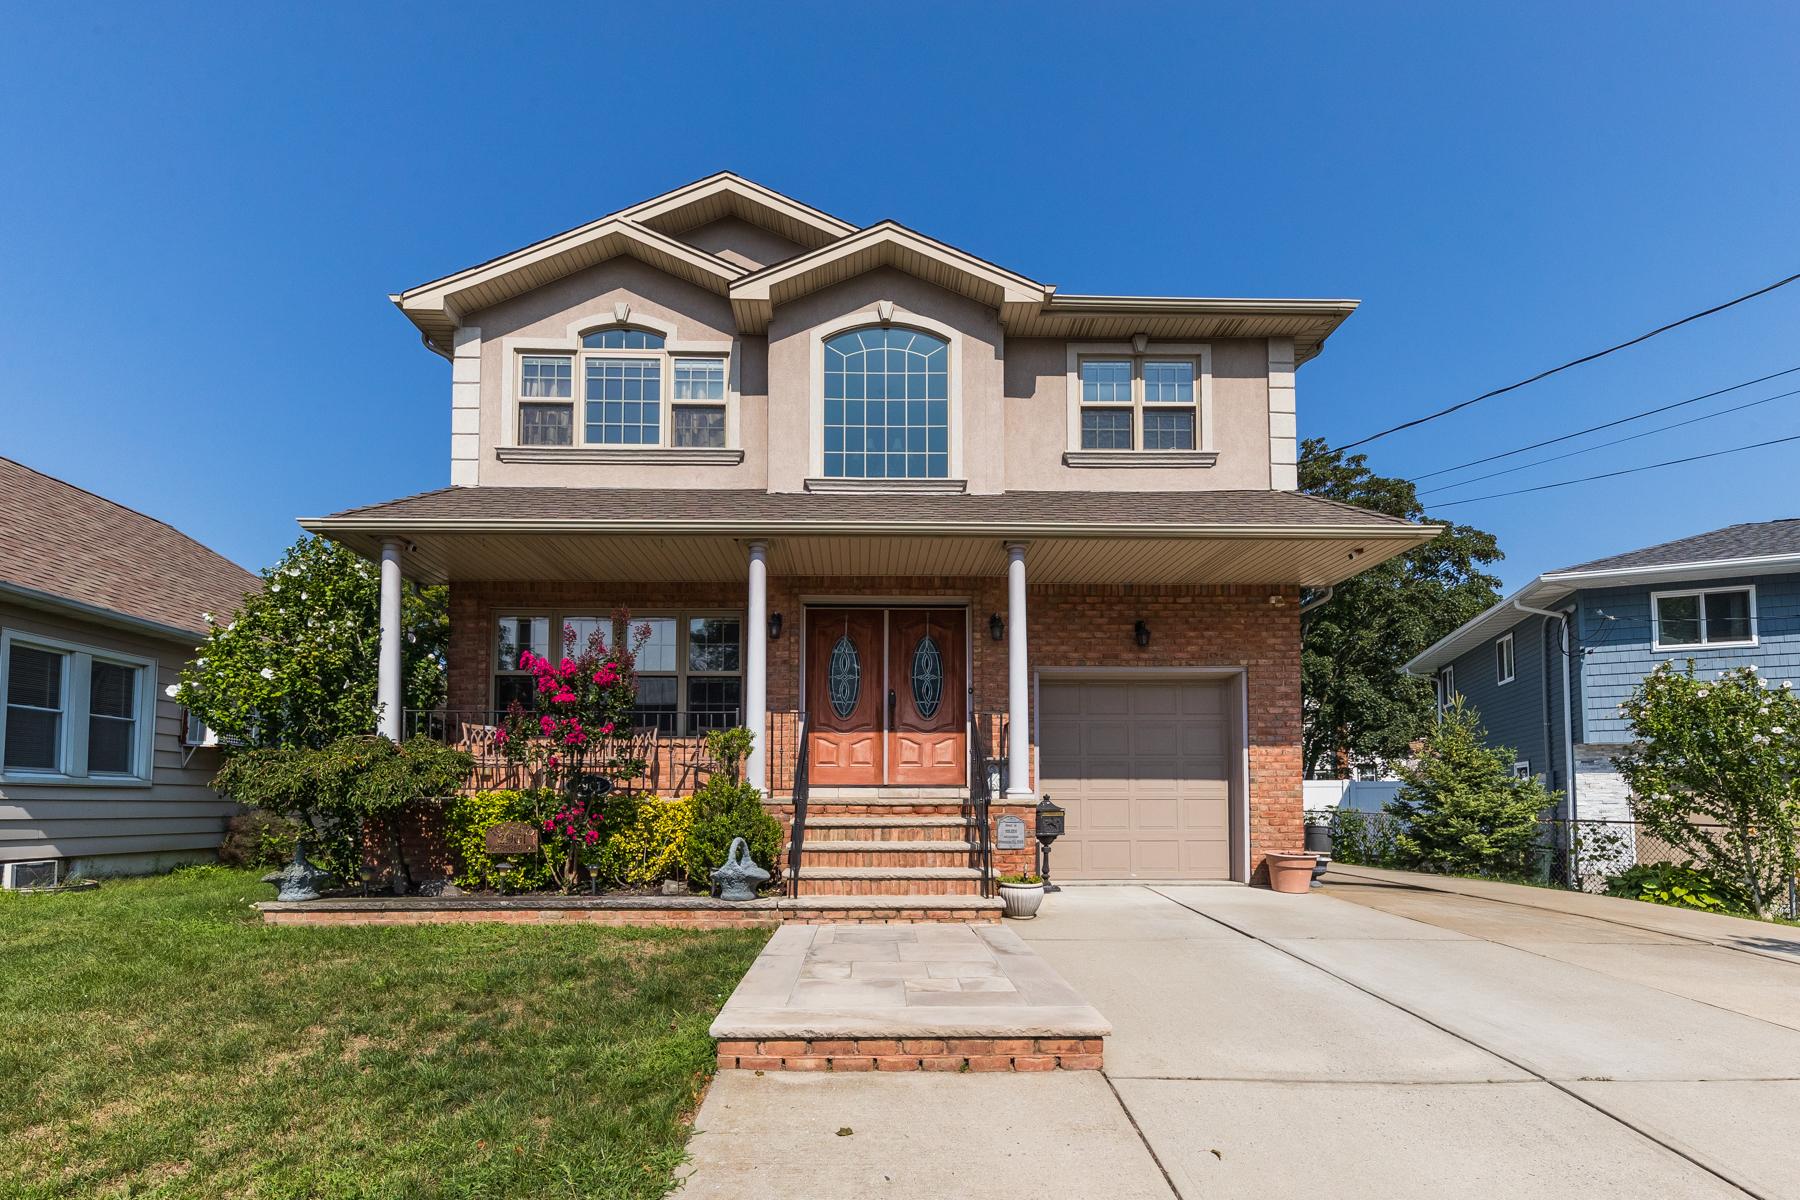 Single Family Homes for Active at Oceanside 2901 Beverly Rd Oceanside, New York 11572 United States